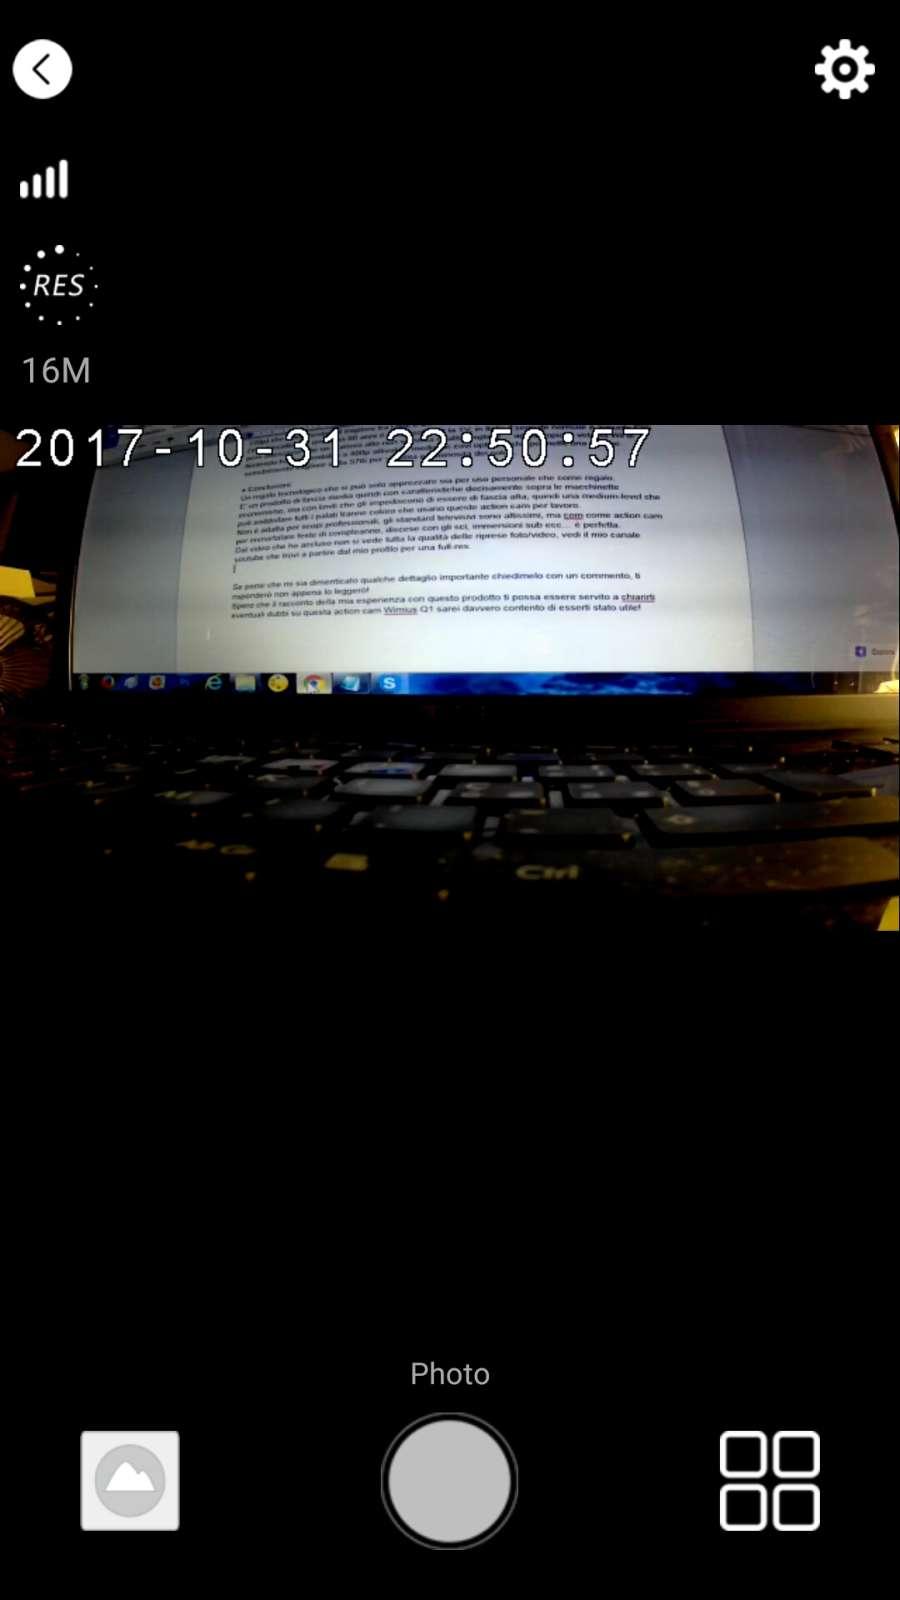 Screenshot_2017-10-31-22-50-59